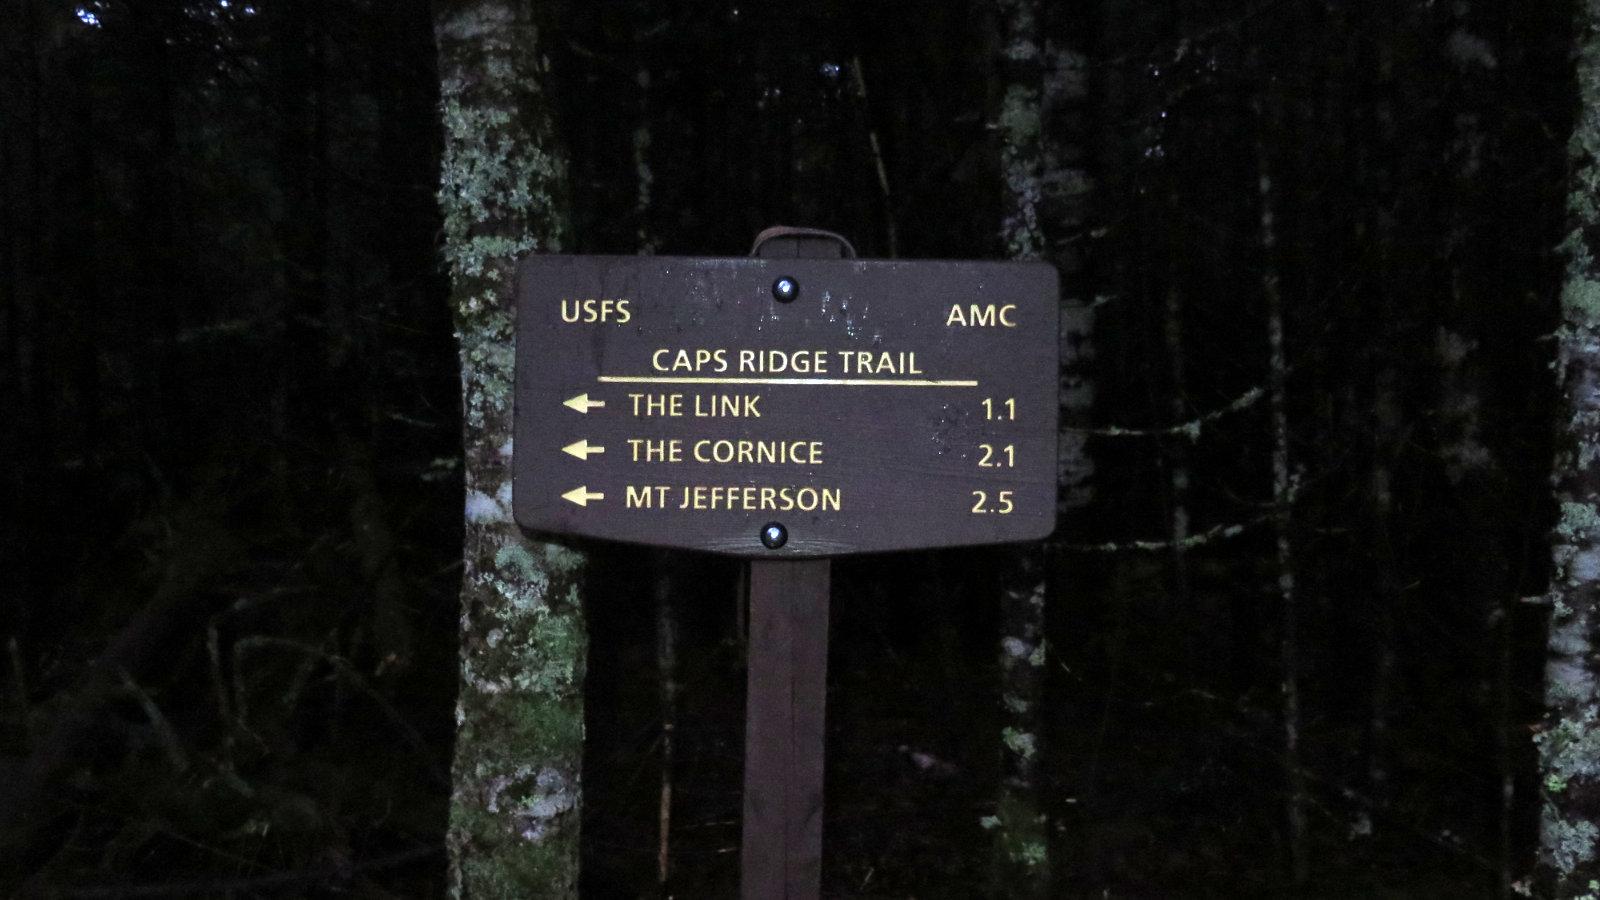 Caps-Ridge-Trailhead-Jefferson-20191028